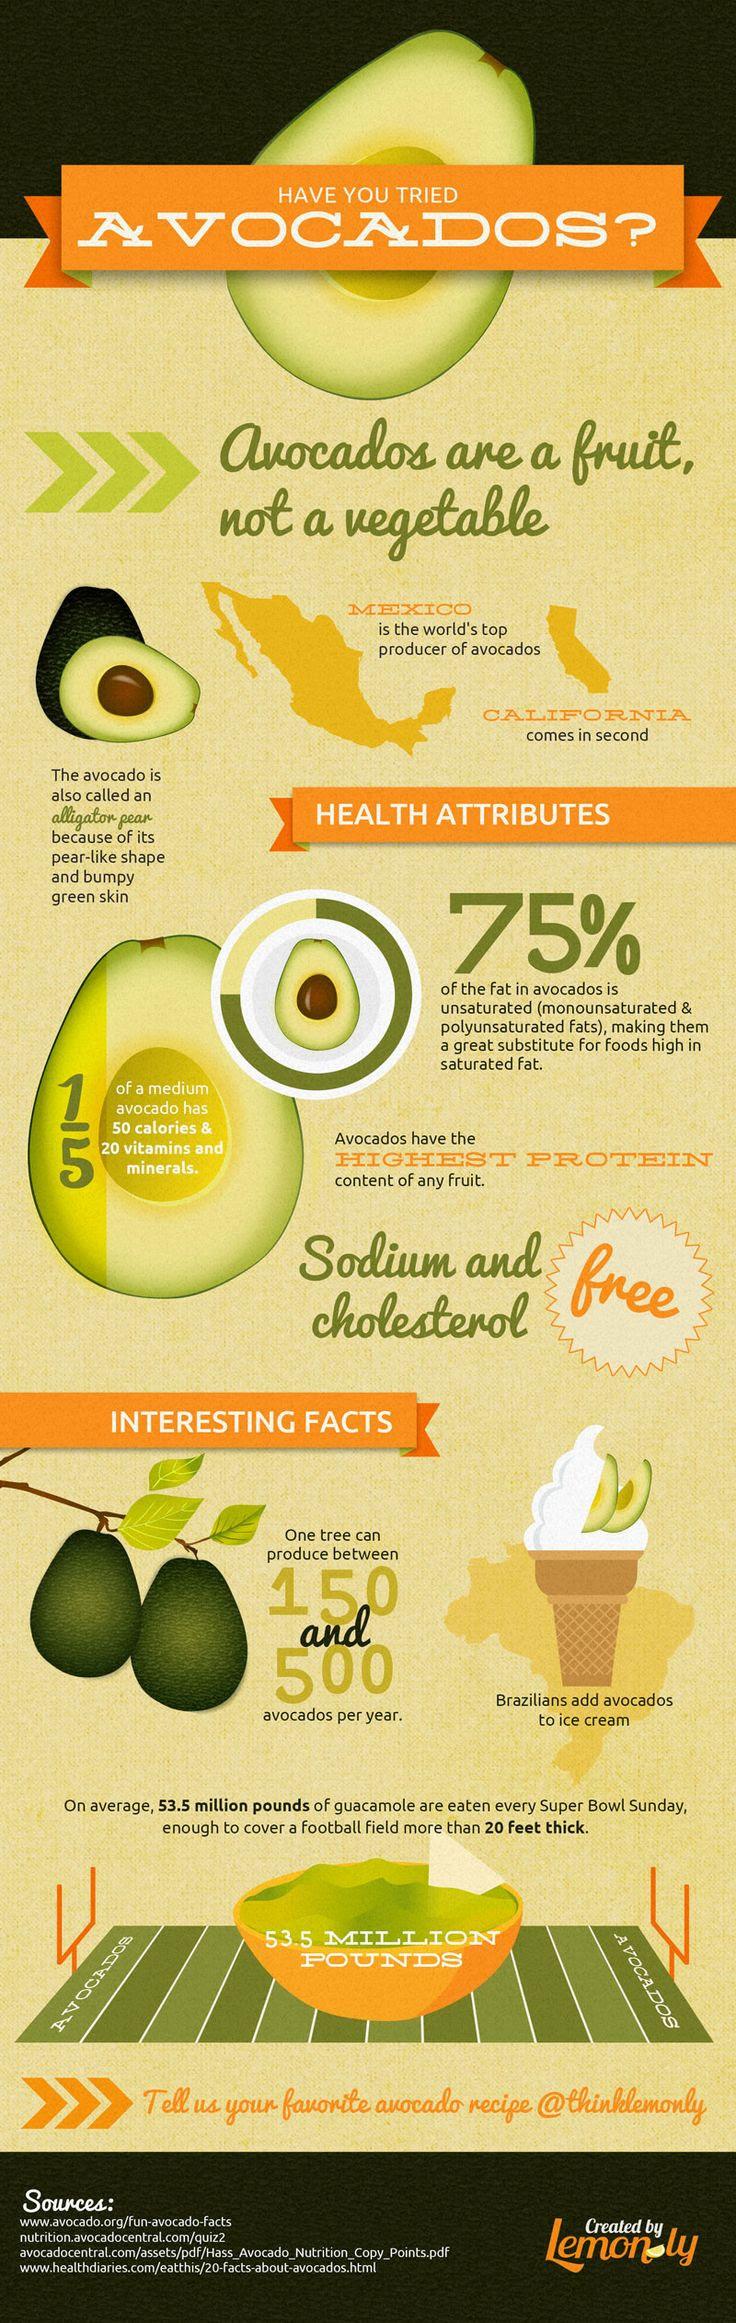 The Health Benefits of Avocado